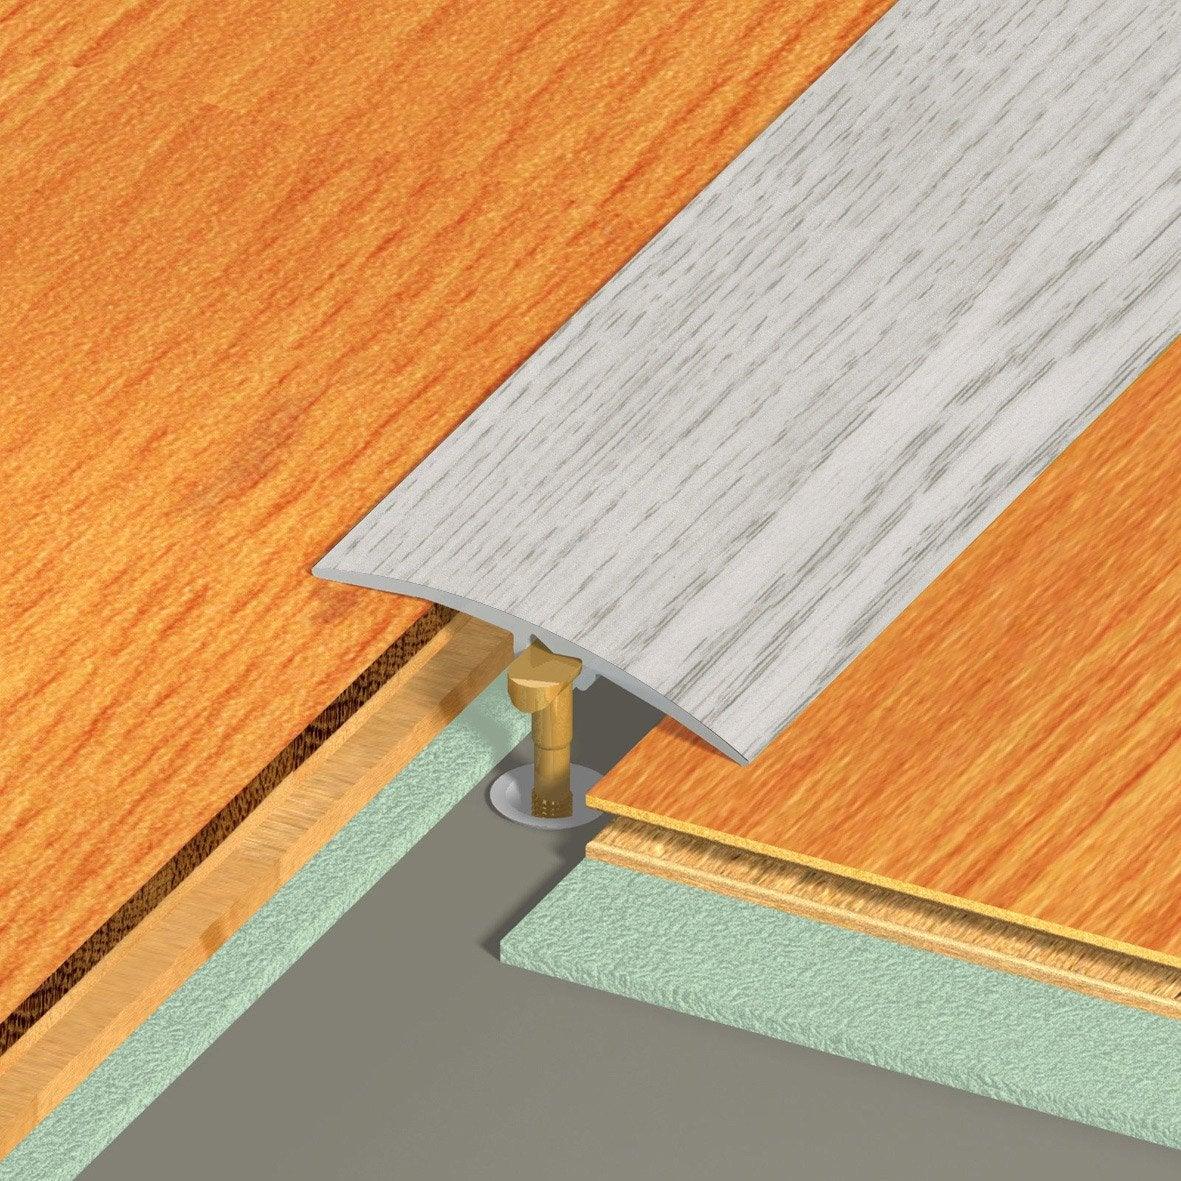 Barre de seuil aluminium rev tu d co d cor ch ne x l 4 1 cm leroy merlin - Barre de seuil rattrapage de niveau ...